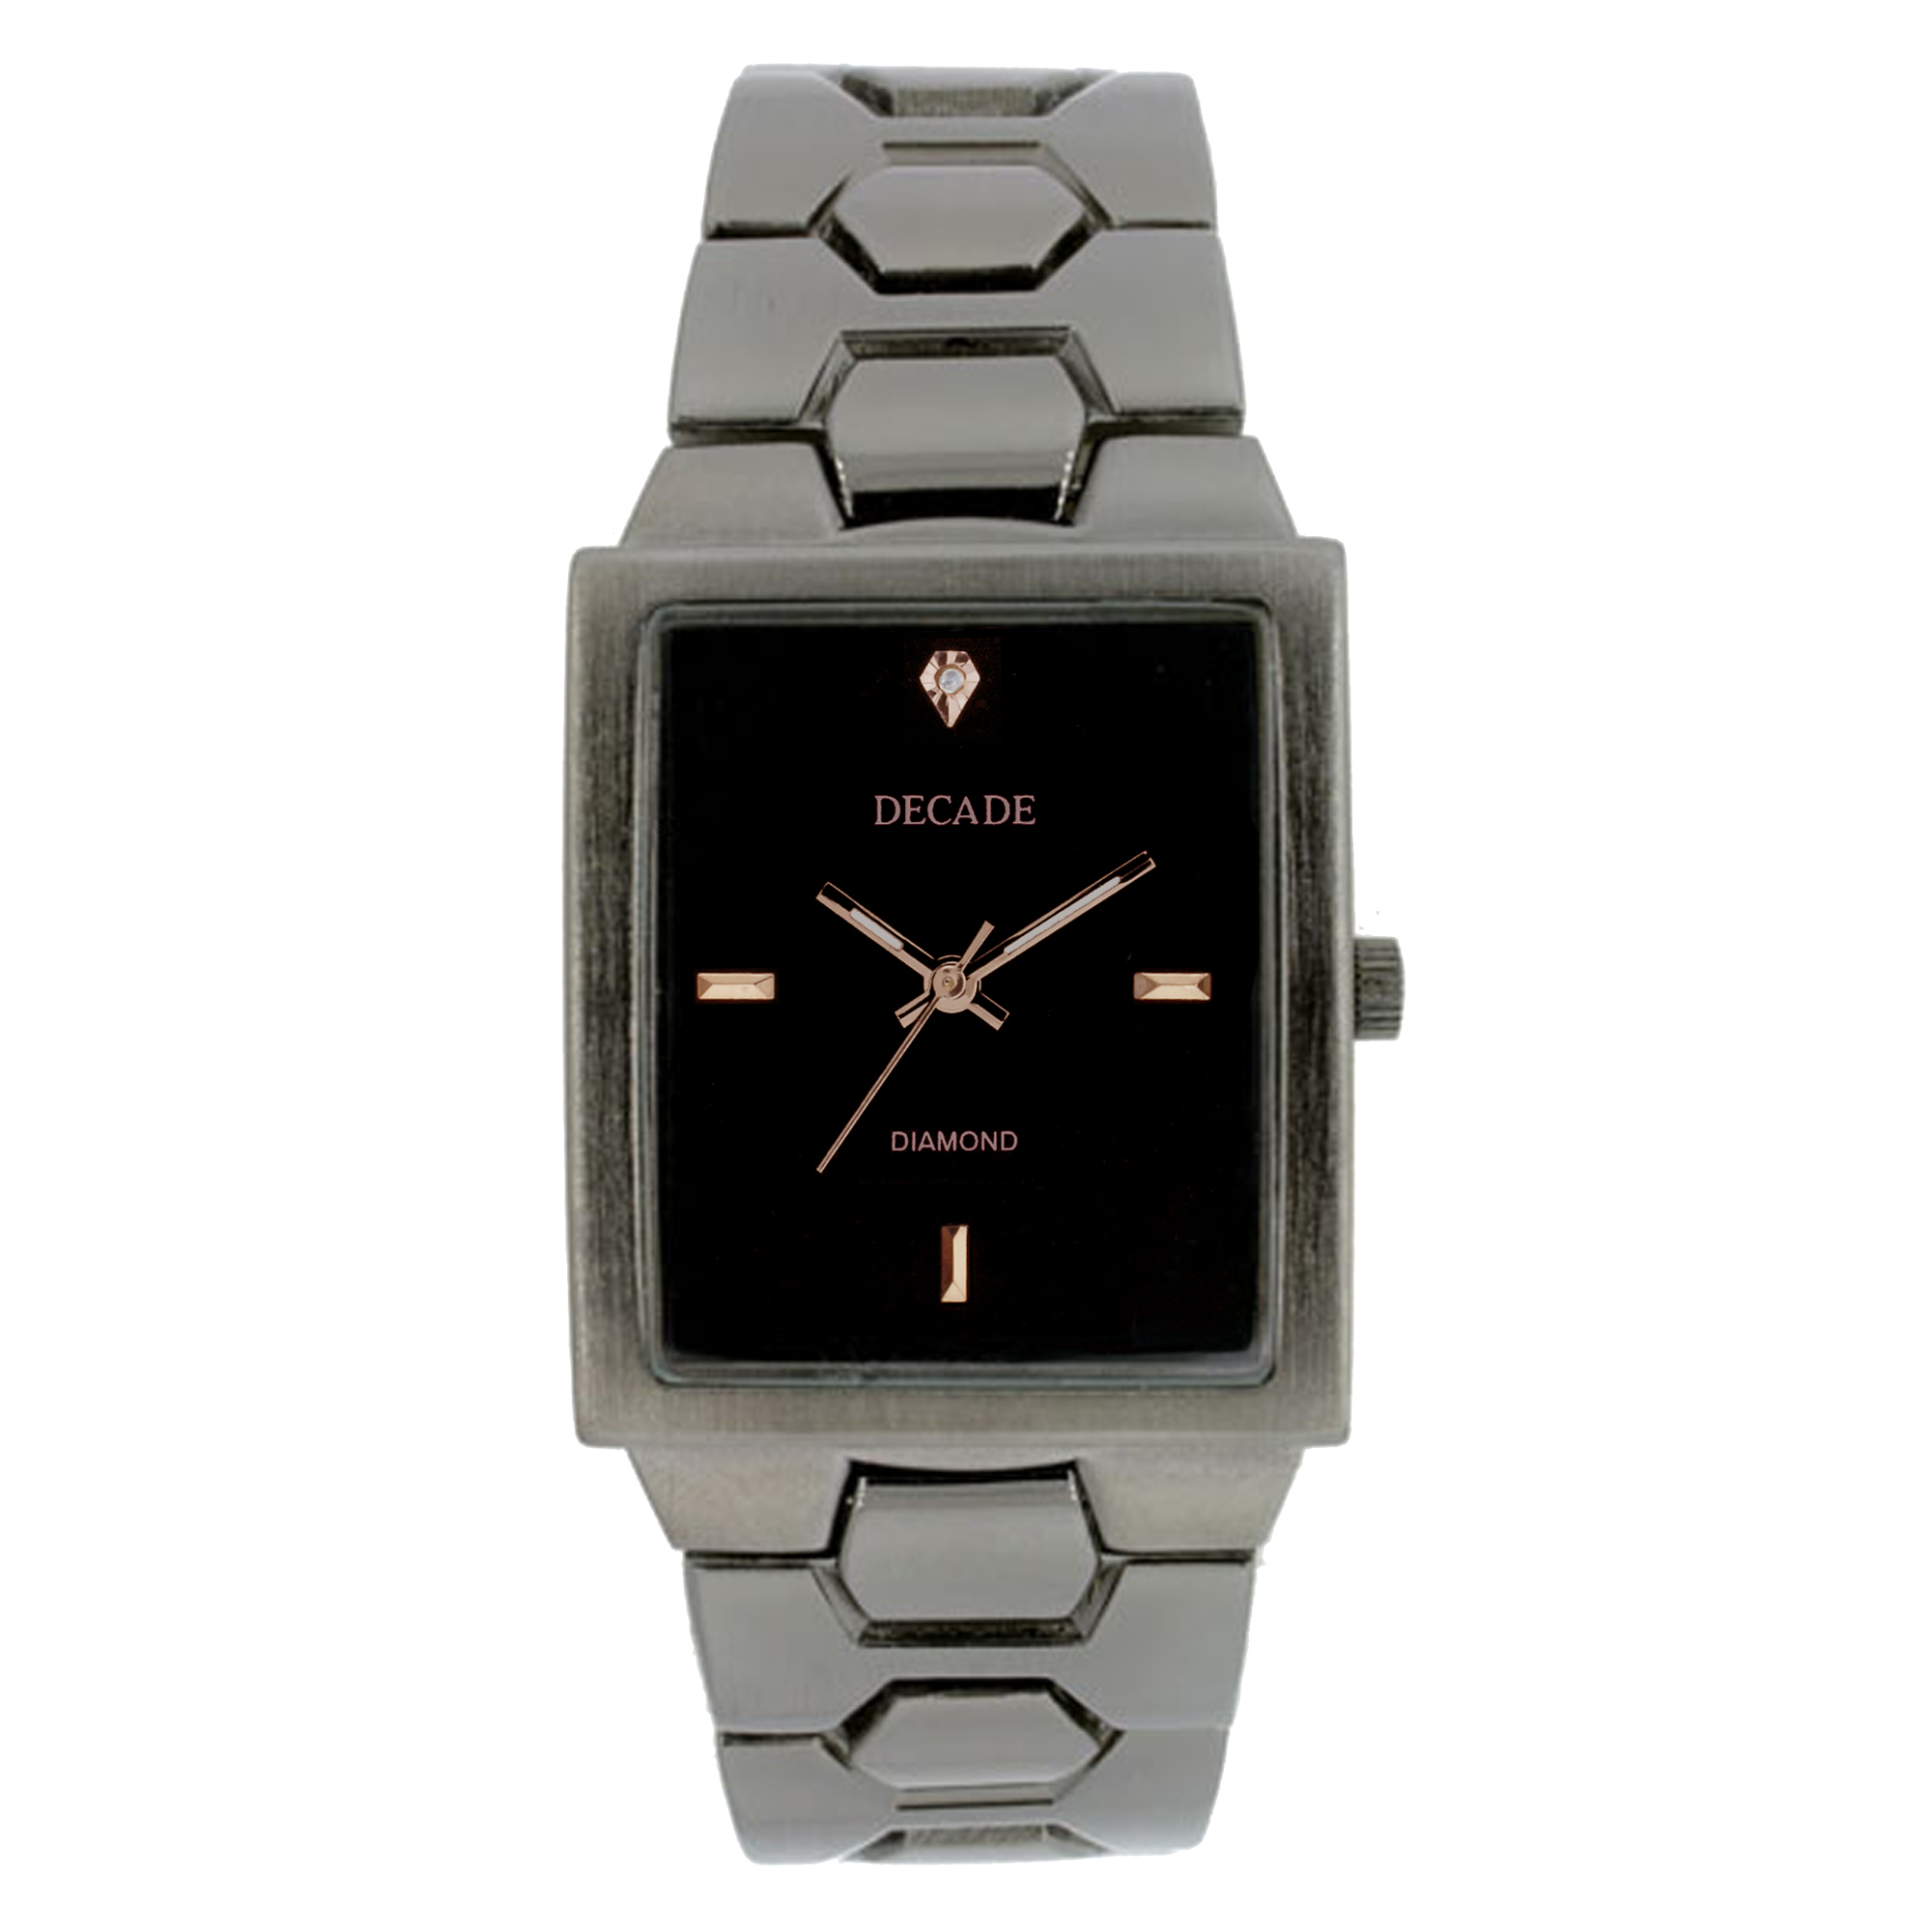 Gunmetal Geniune Diamond Dial Watch